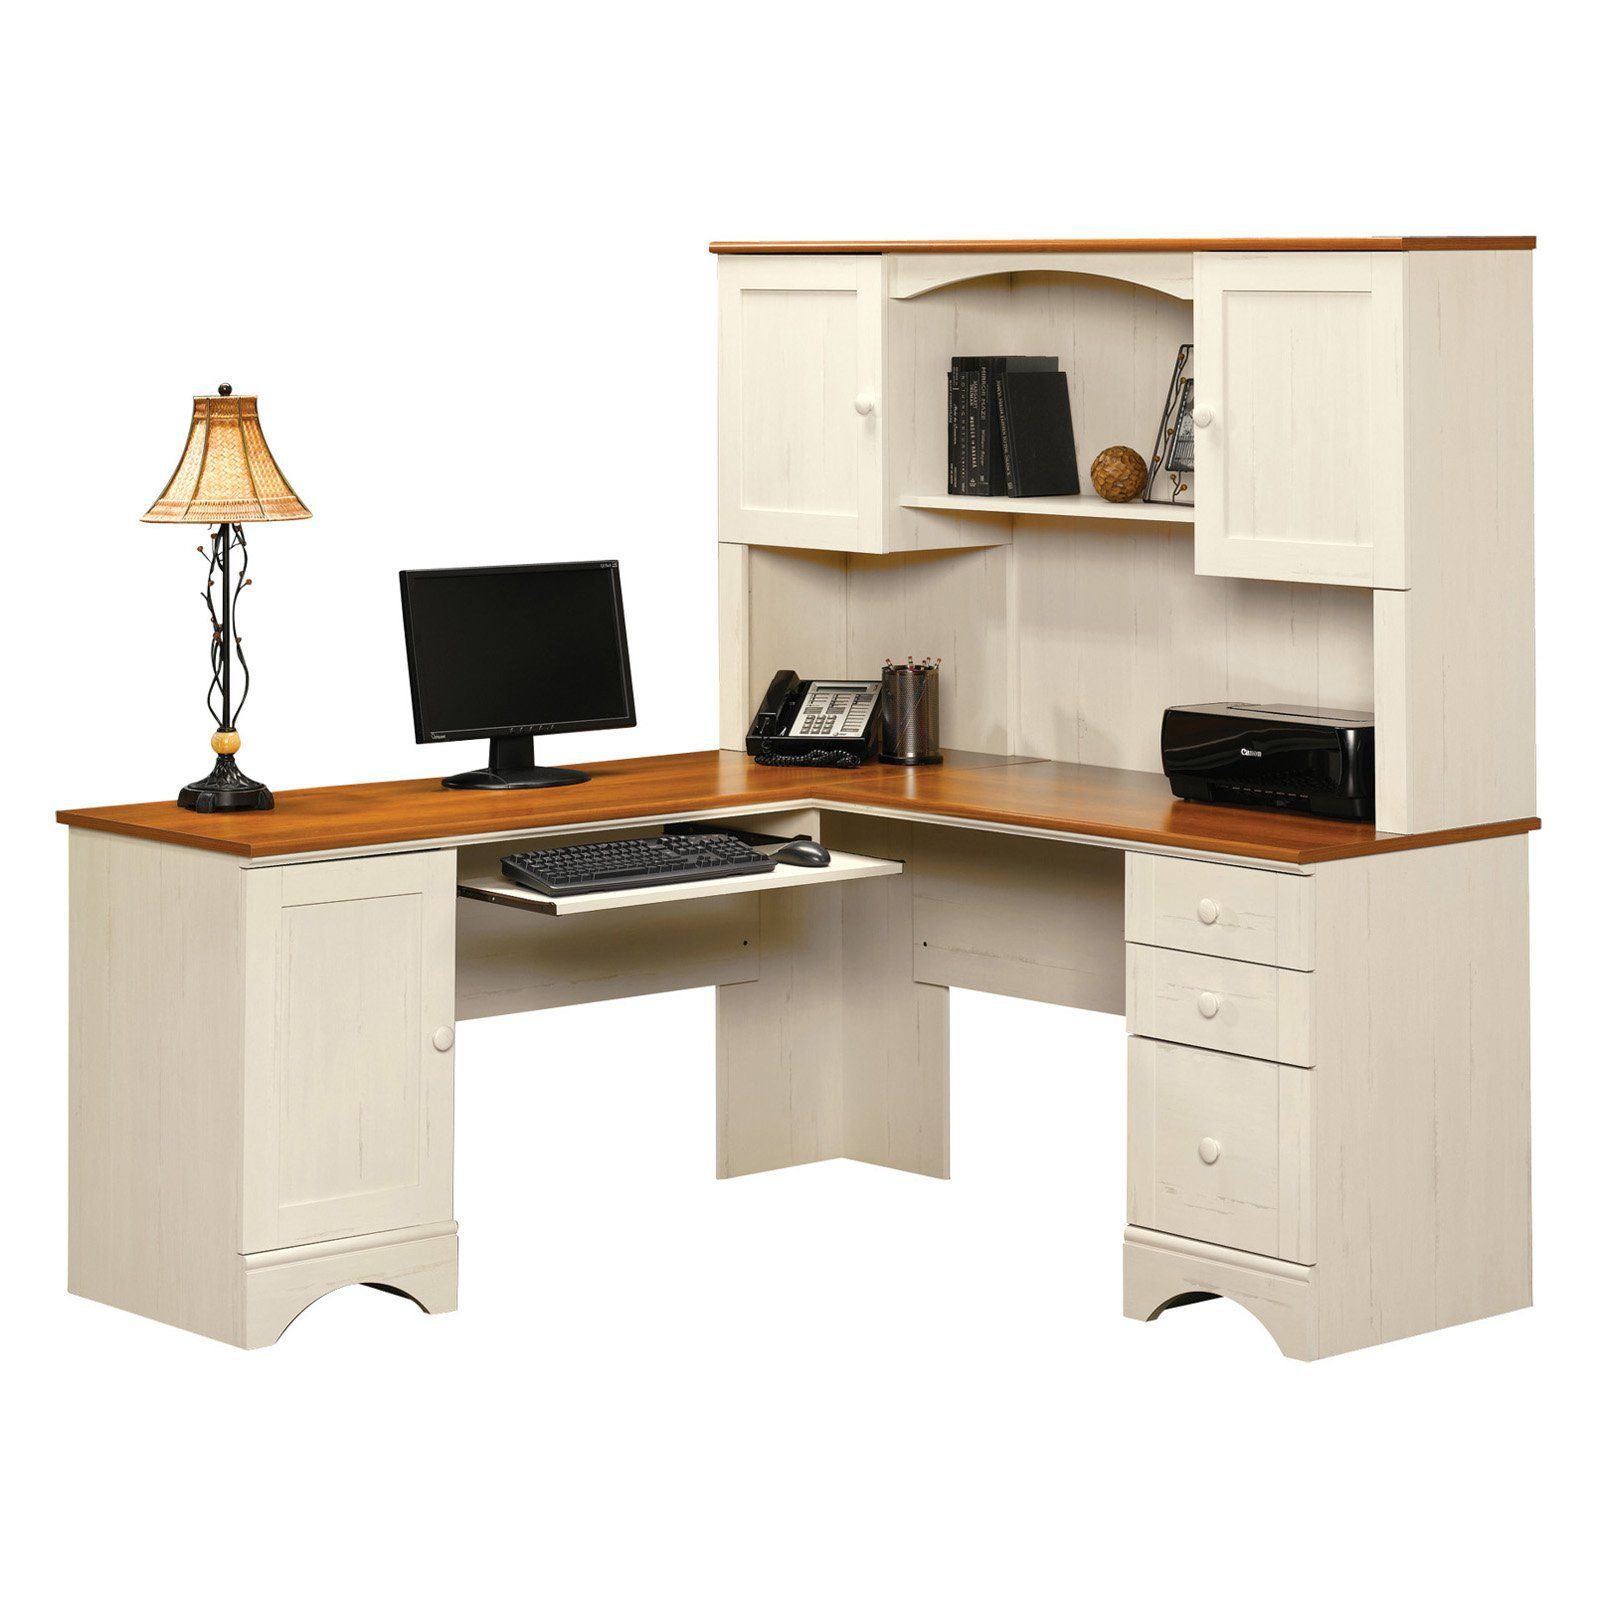 Corner Computer Desk, Sauder Antique White Desk With Hutch